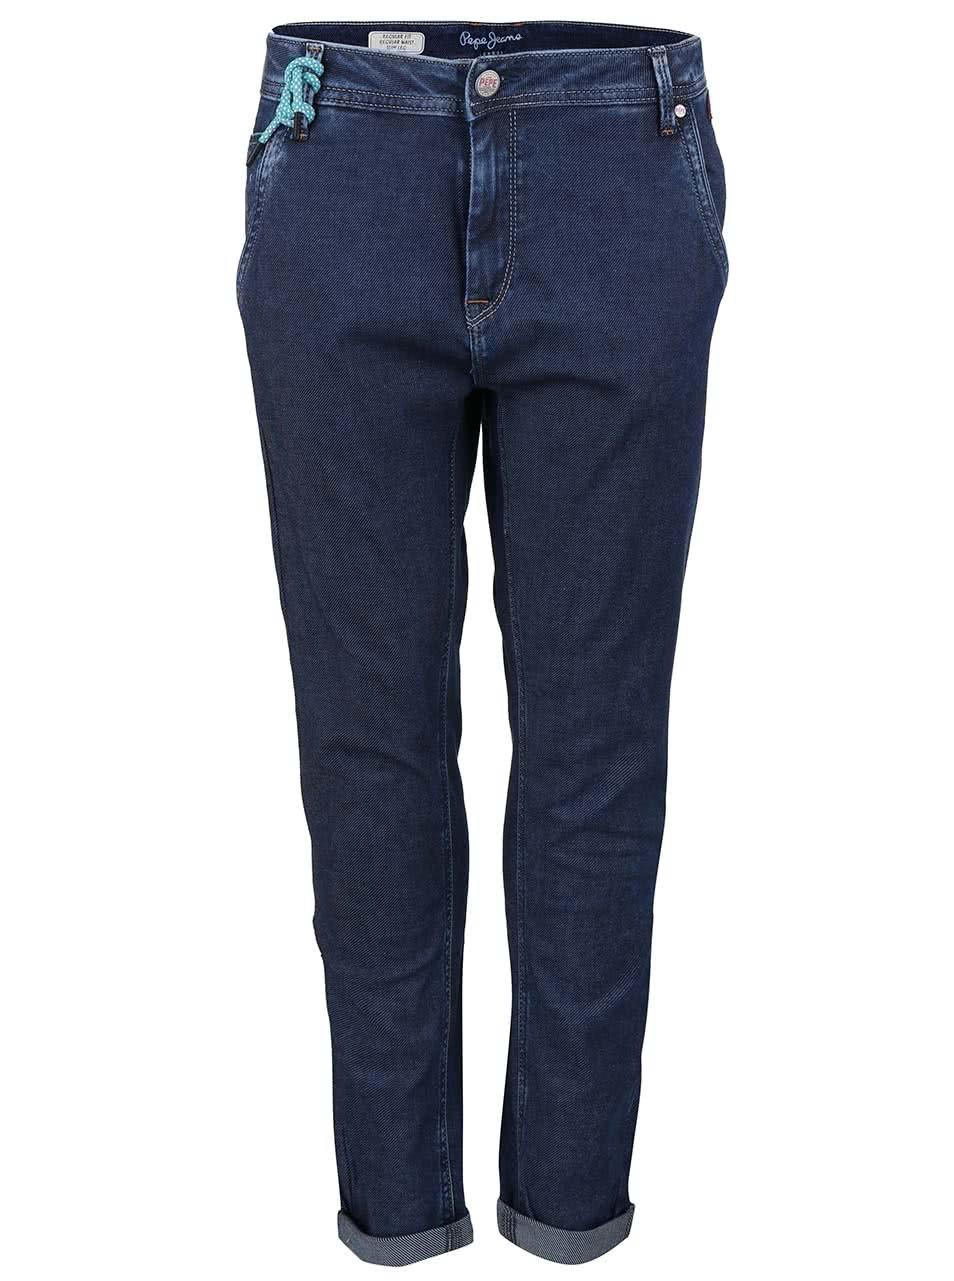 Modré dámské džíny Pepe Jeans Flow Low